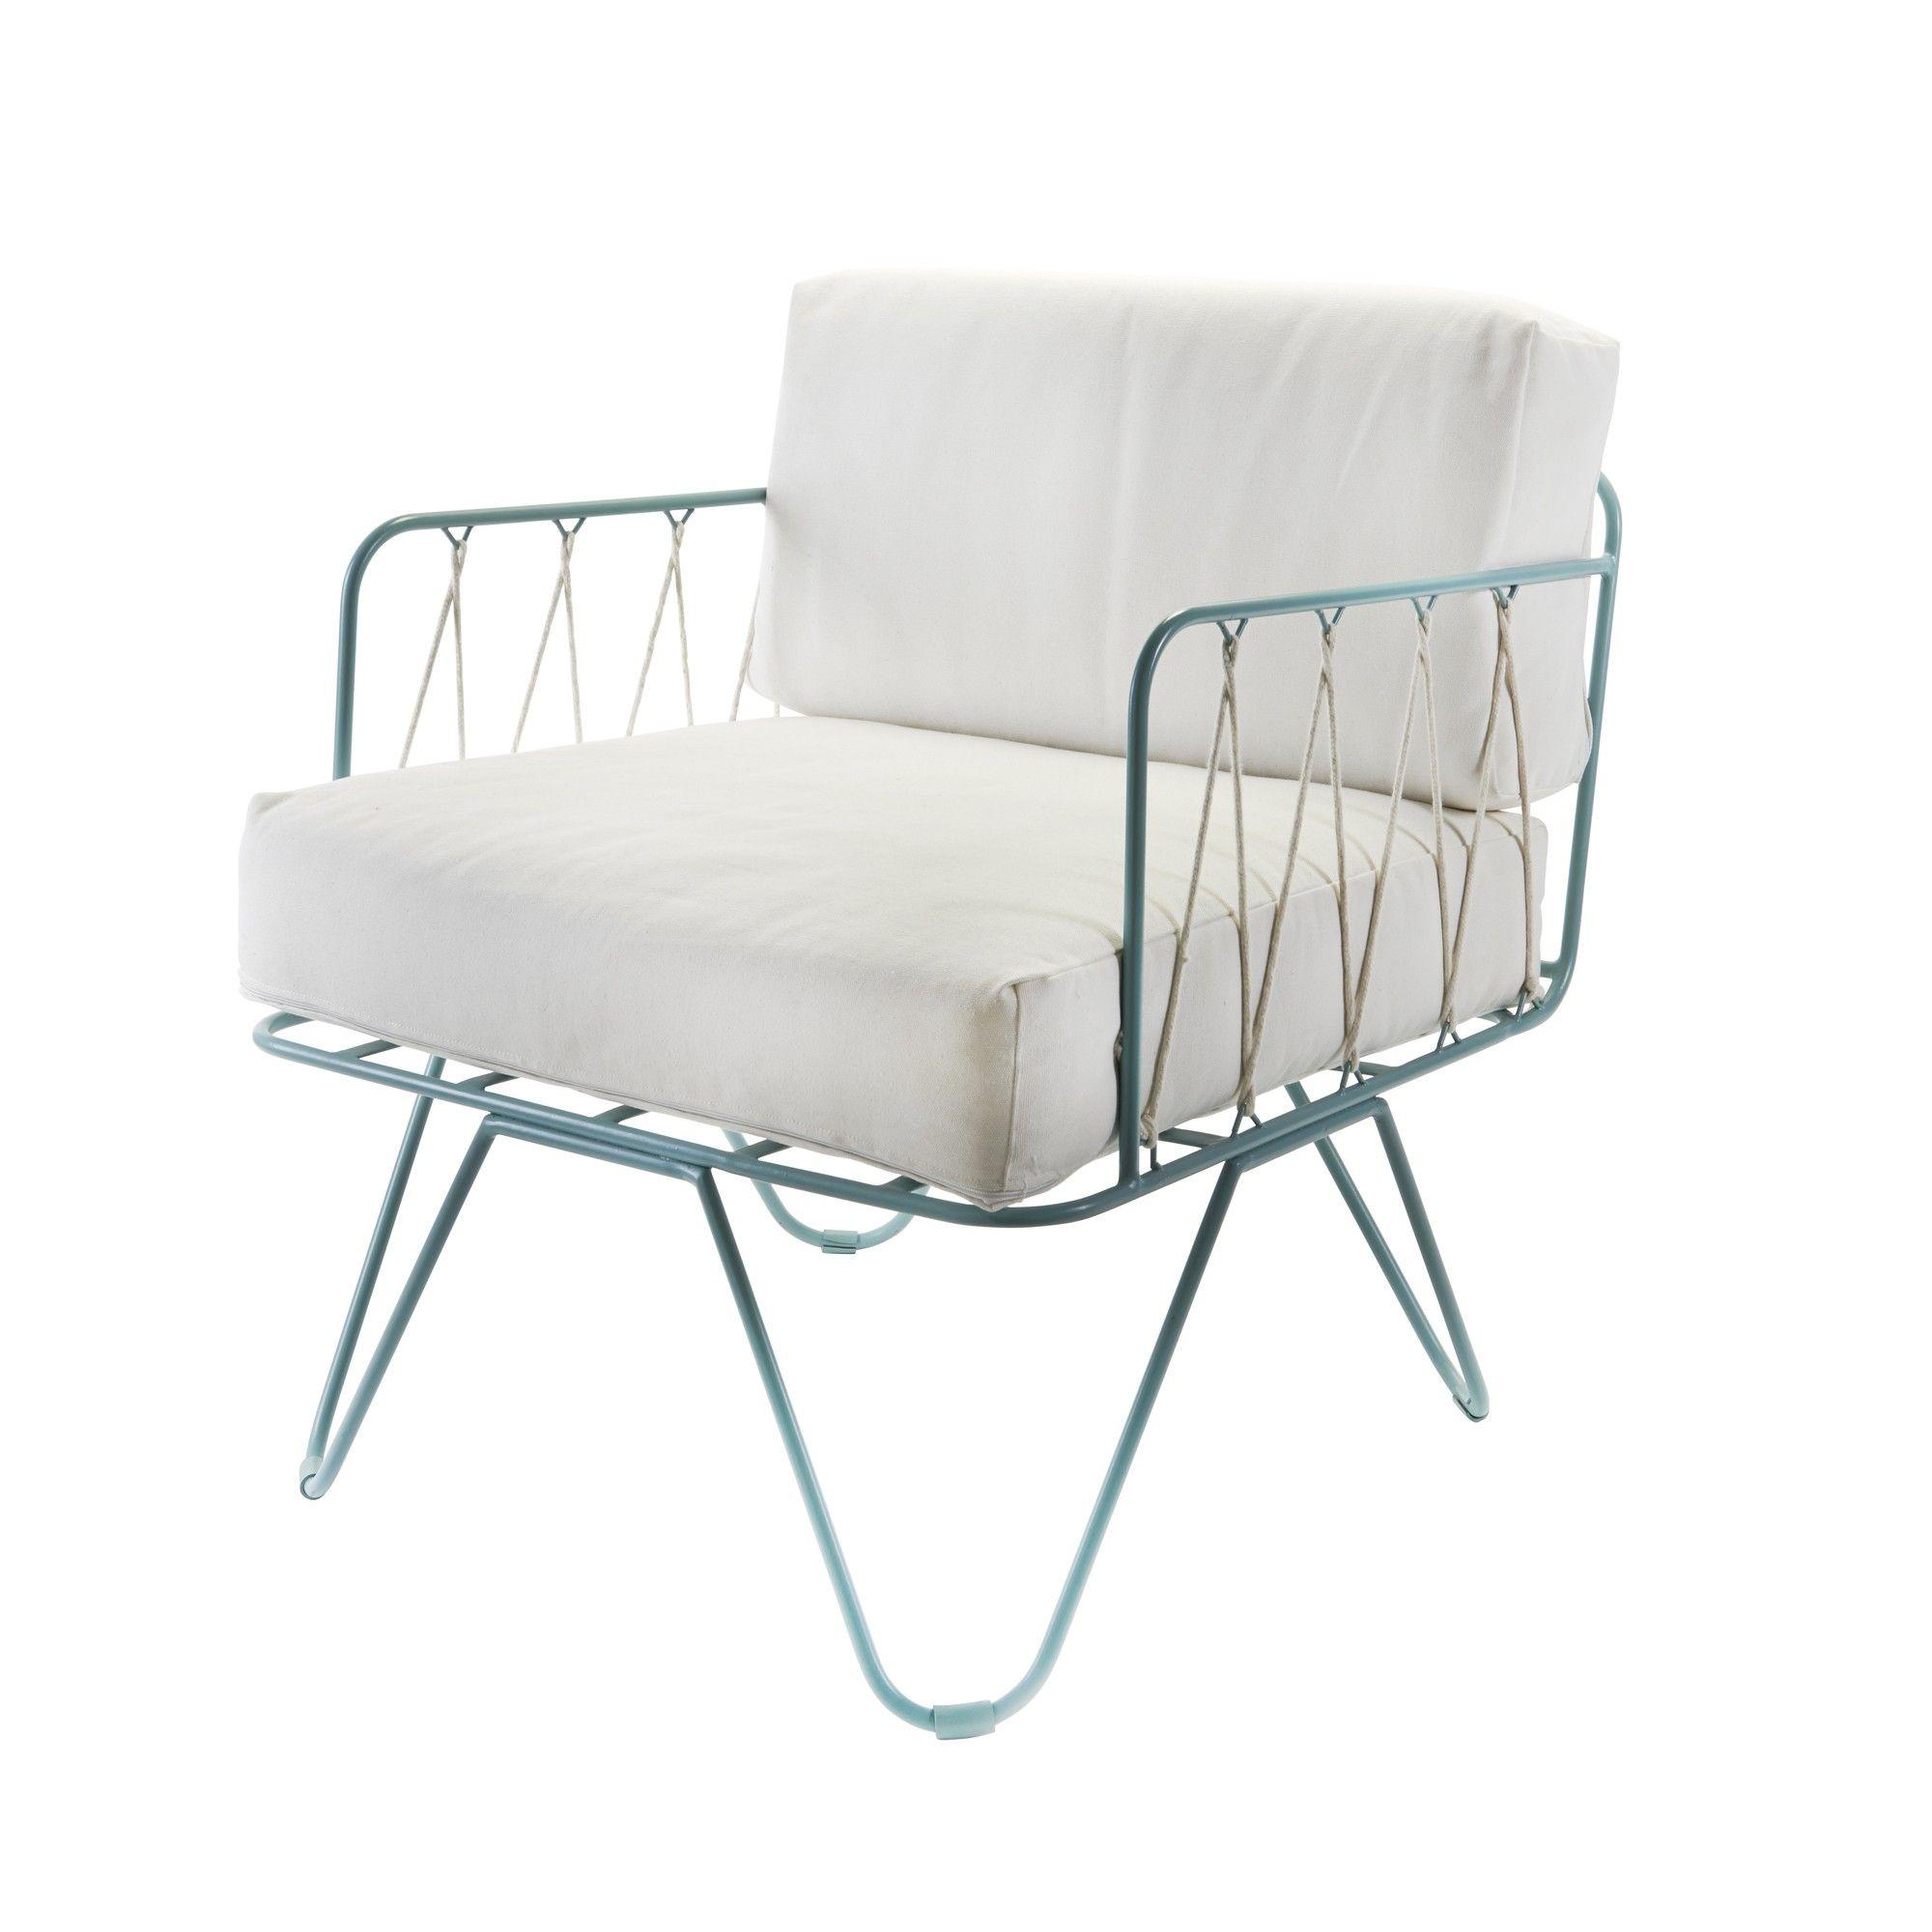 fauteuil honor serax indoor outdoor pinterest wishful thinking indoor outdoor and. Black Bedroom Furniture Sets. Home Design Ideas